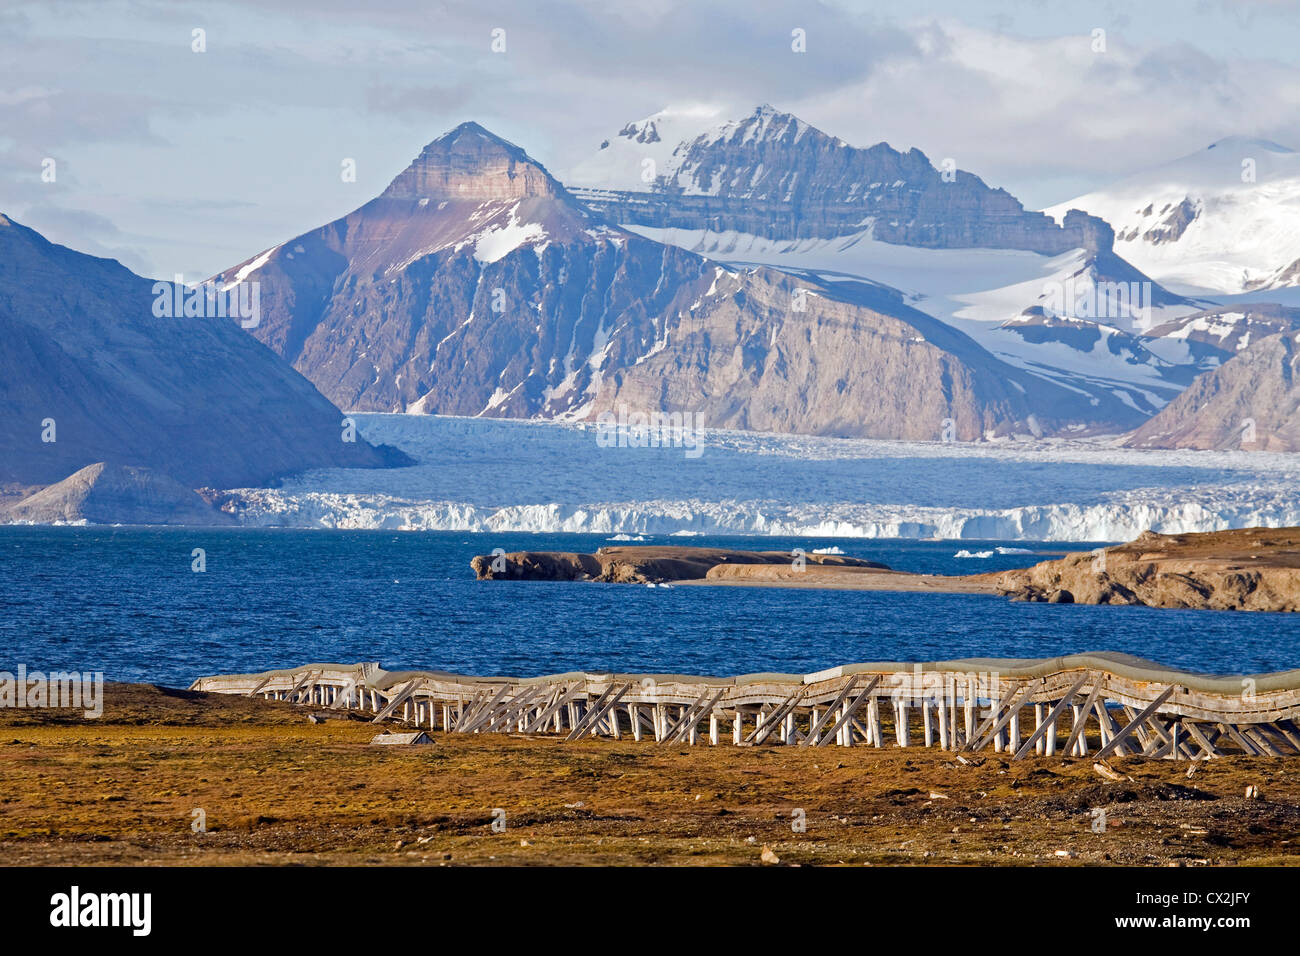 Overground water pipe transporting drinking water to Ny-Ålesund, former mining village on Spitsbergen, Svalbard, - Stock Image